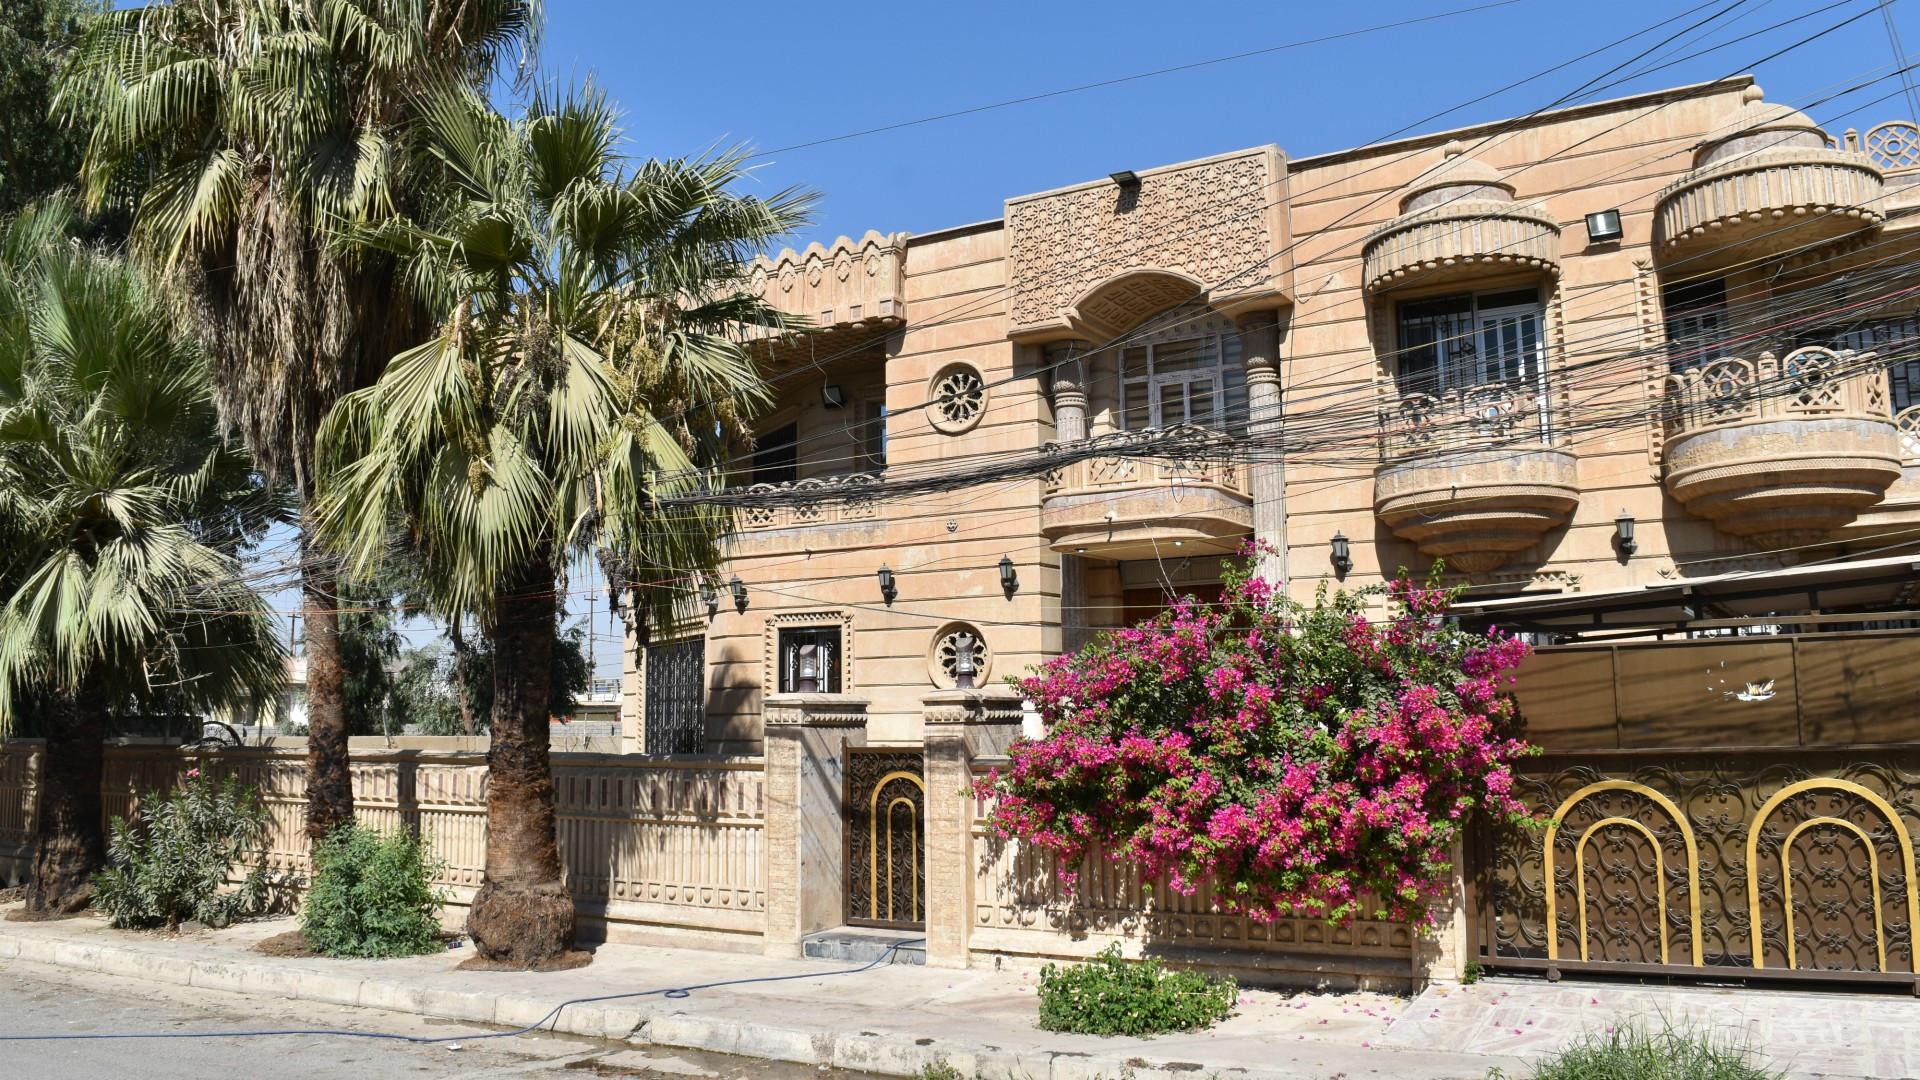 Intaktes Haus in Mossul   © Jacques Berset